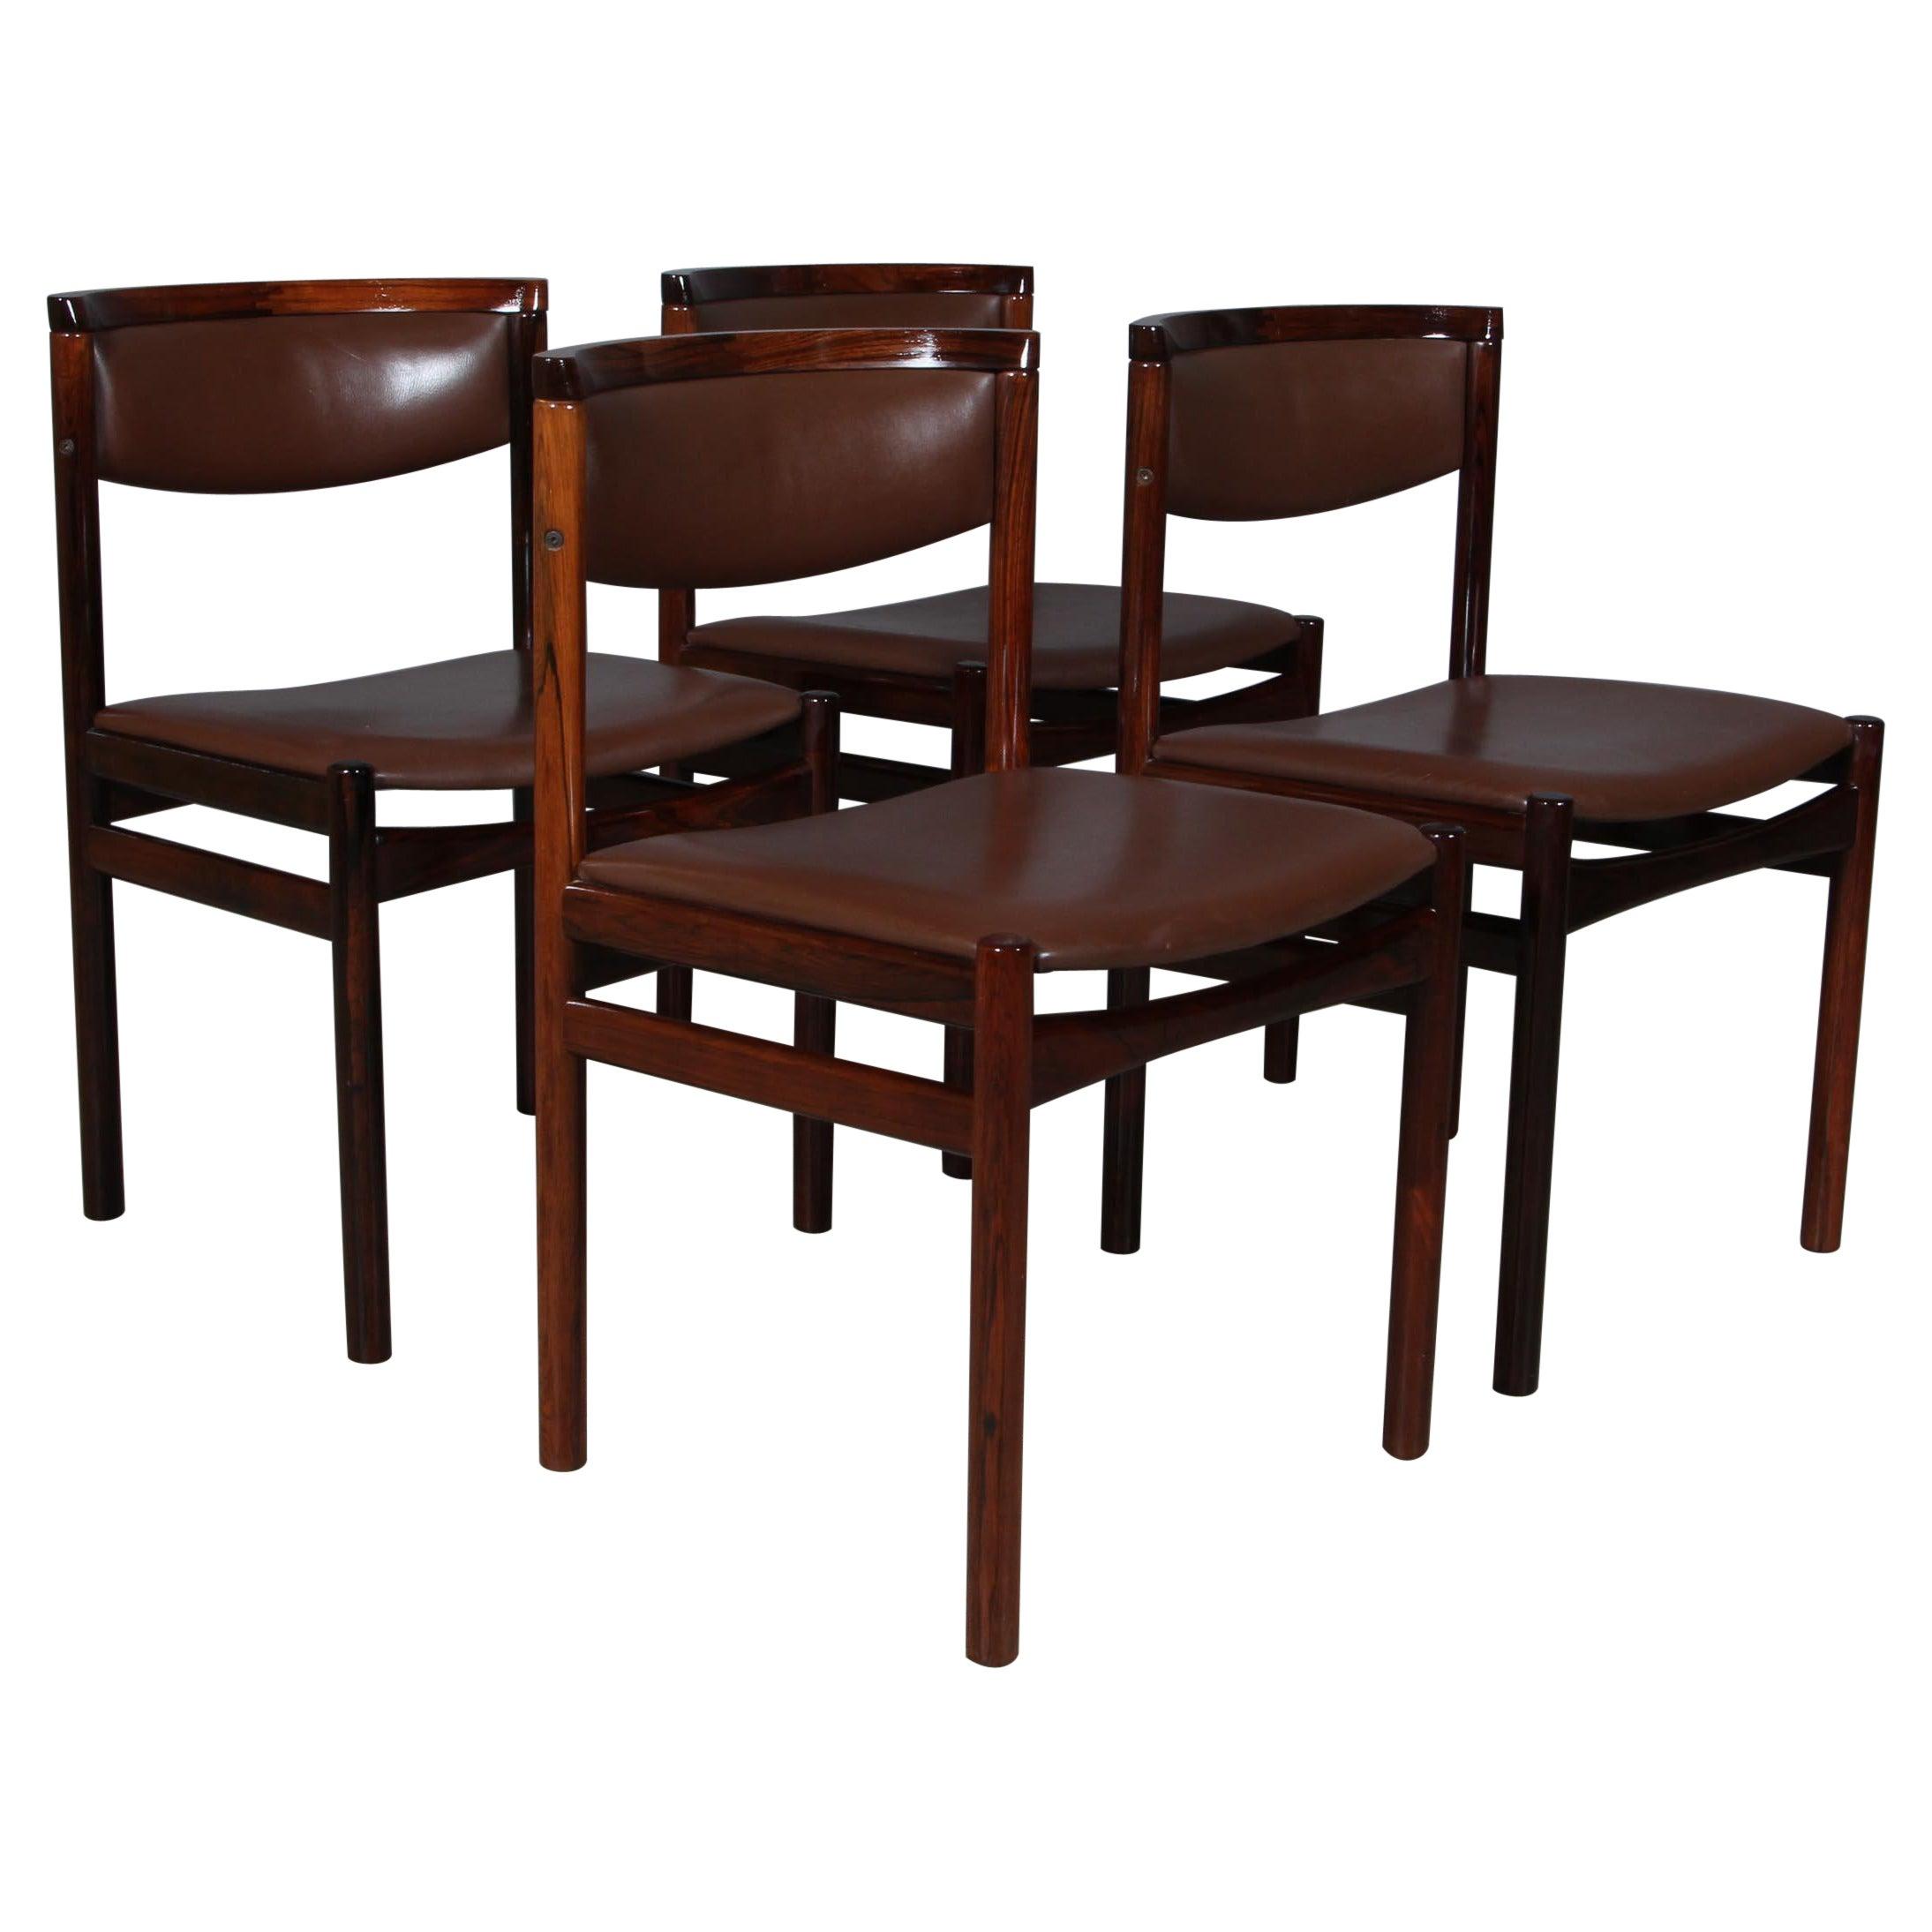 Kurt Østervig, Four Dining Chairs